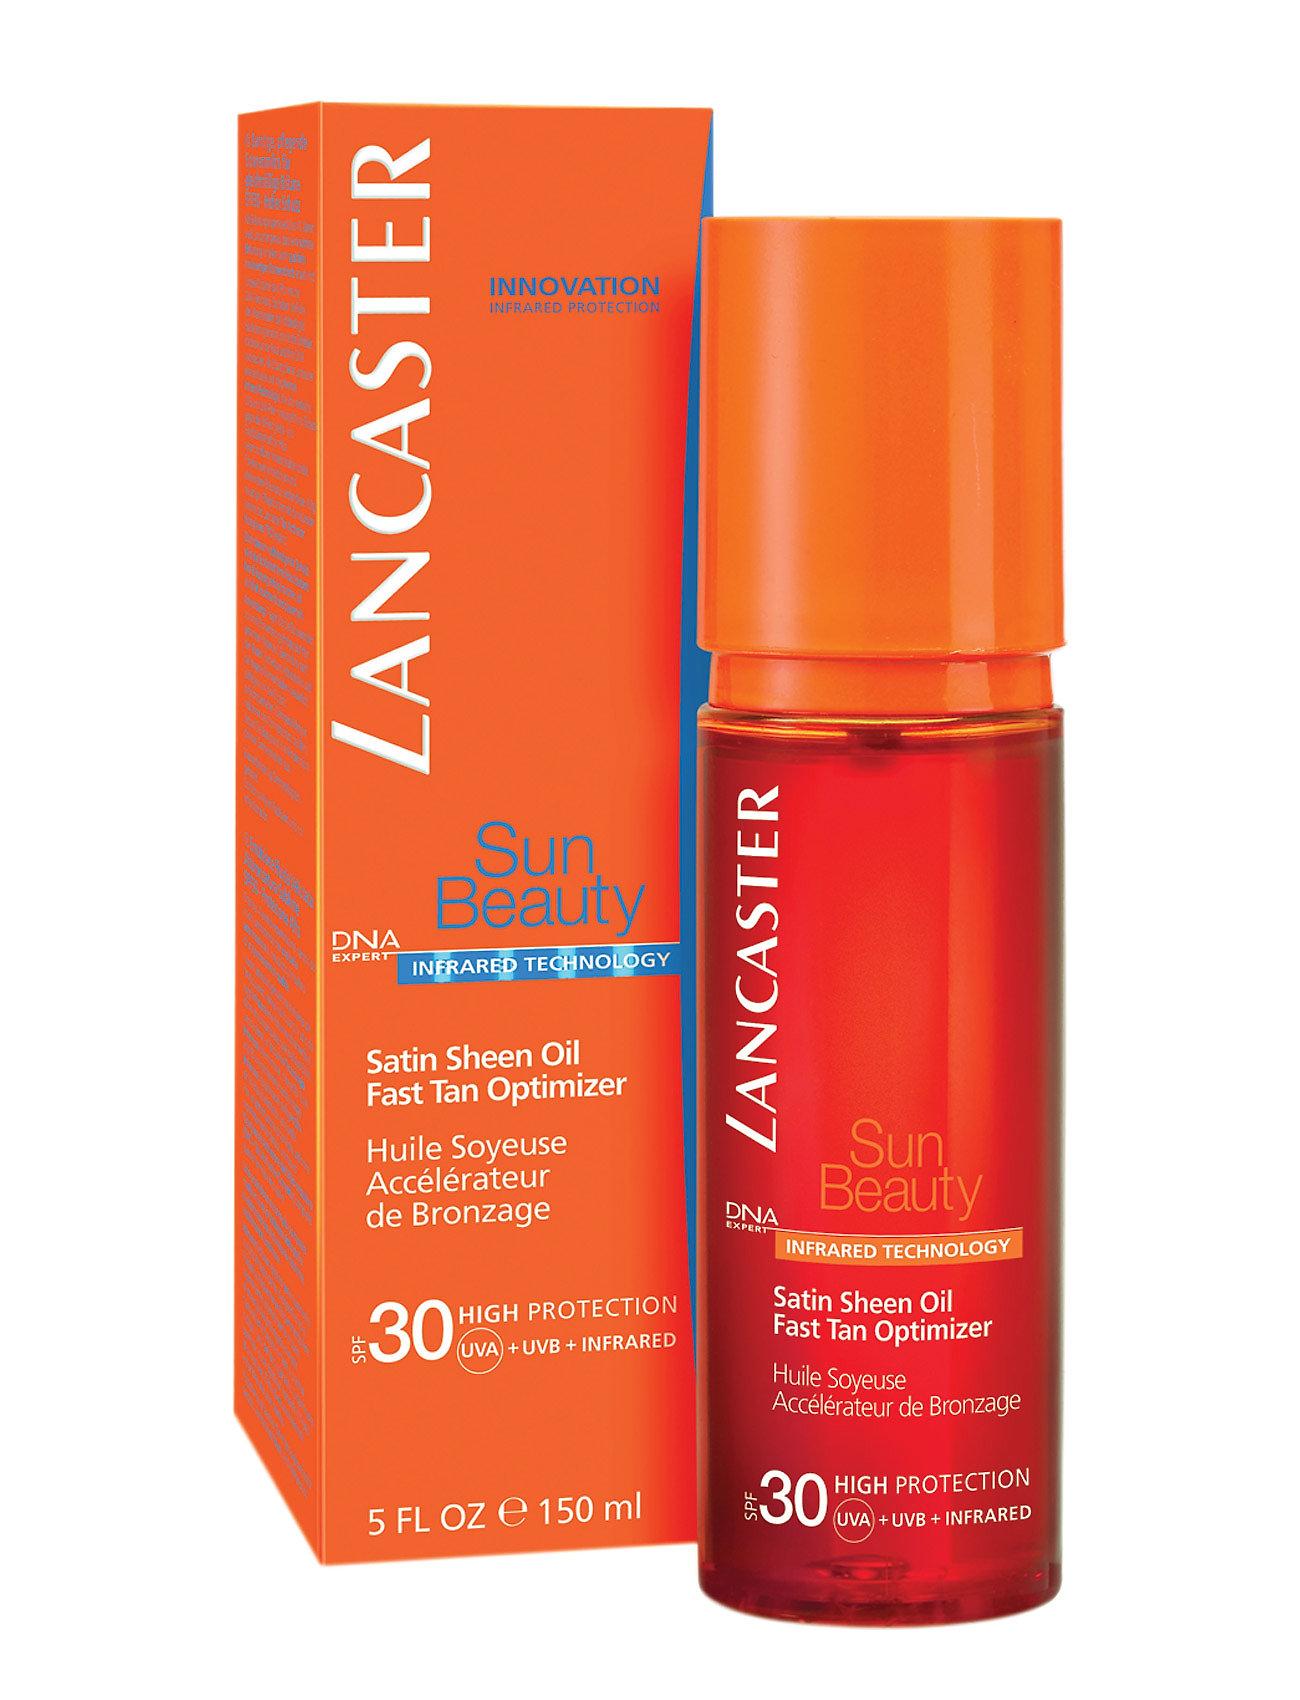 Image of Sun Care Tan Maximizer Fast Tan Satin Sheen Oil Spf30 Beauty MEN Skin Care Sun Products Body Nude Lancaster (3052594897)